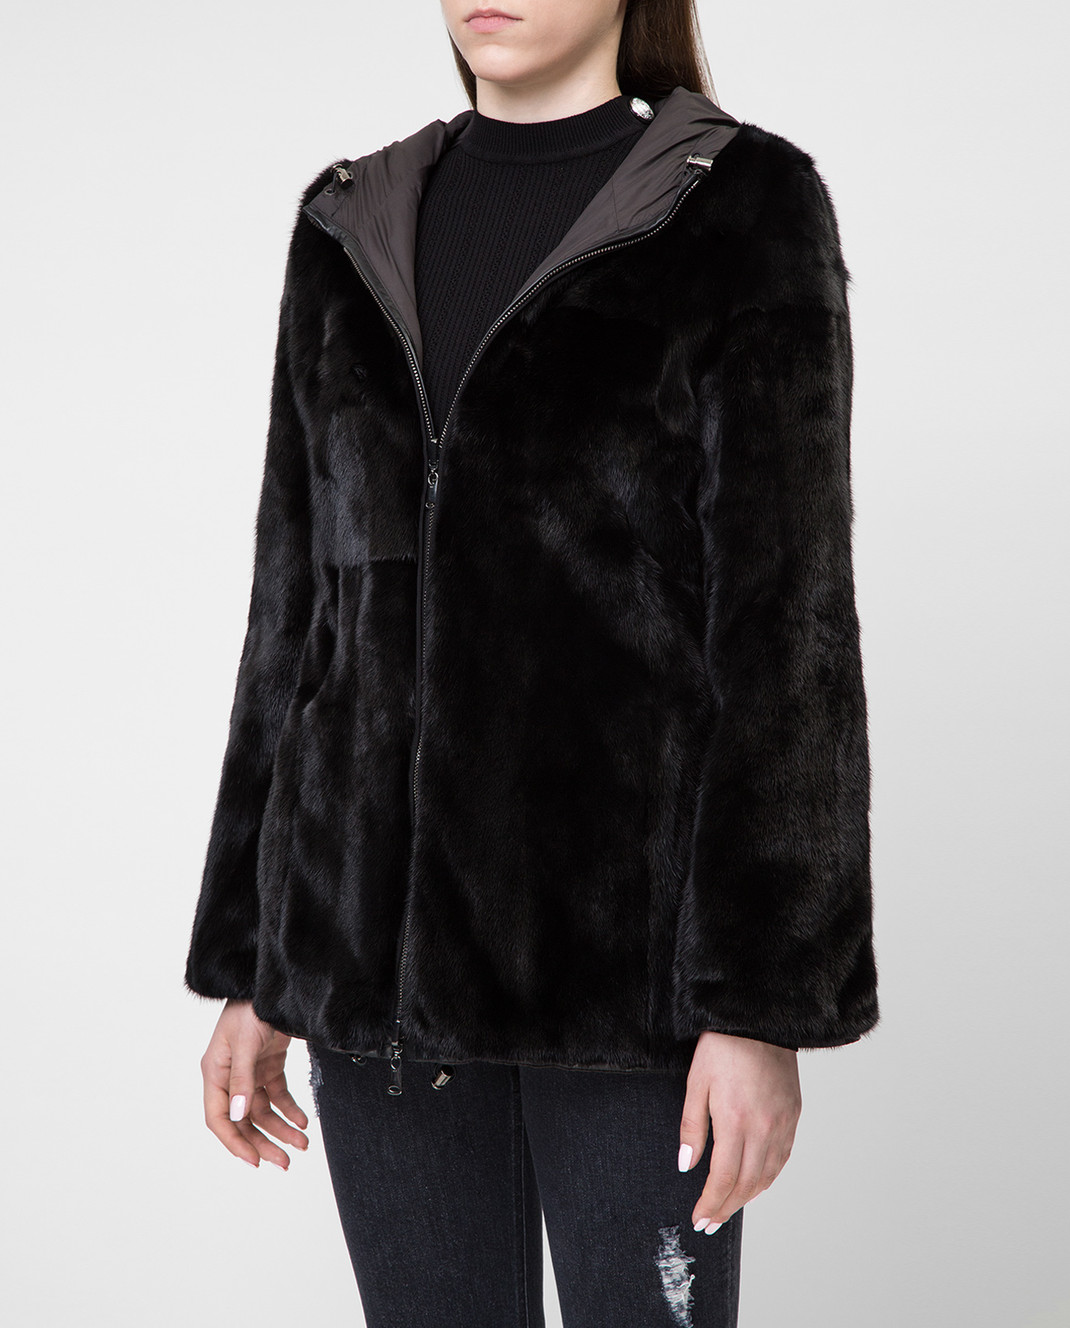 Real Furs House Двусторонняя шуба 941RFH изображение 3